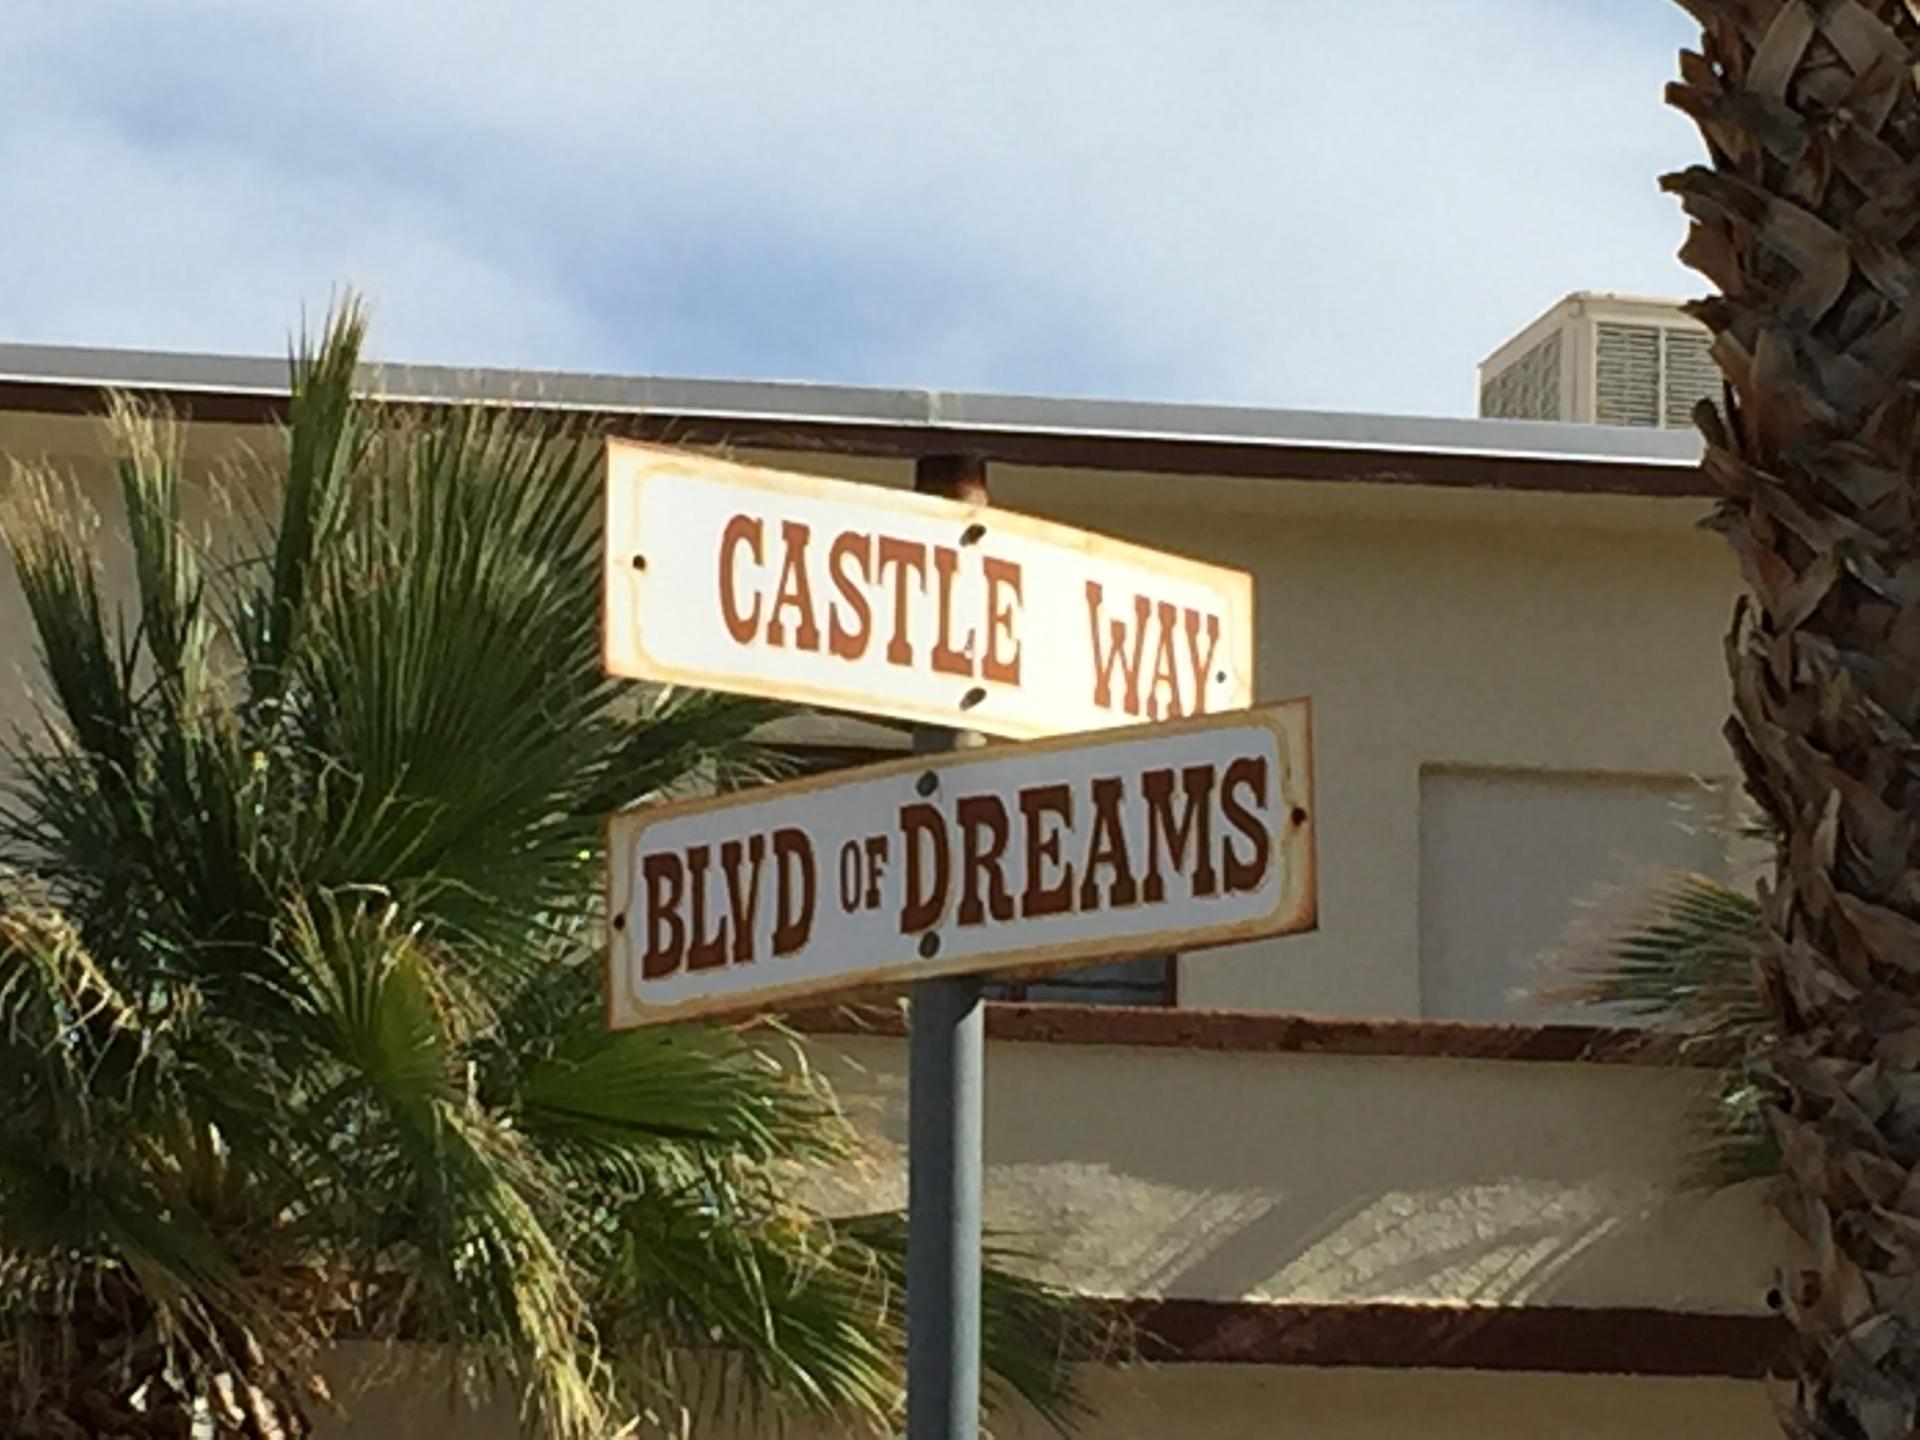 Castle Way & Blvd of Dreams, Zzyxx Rd